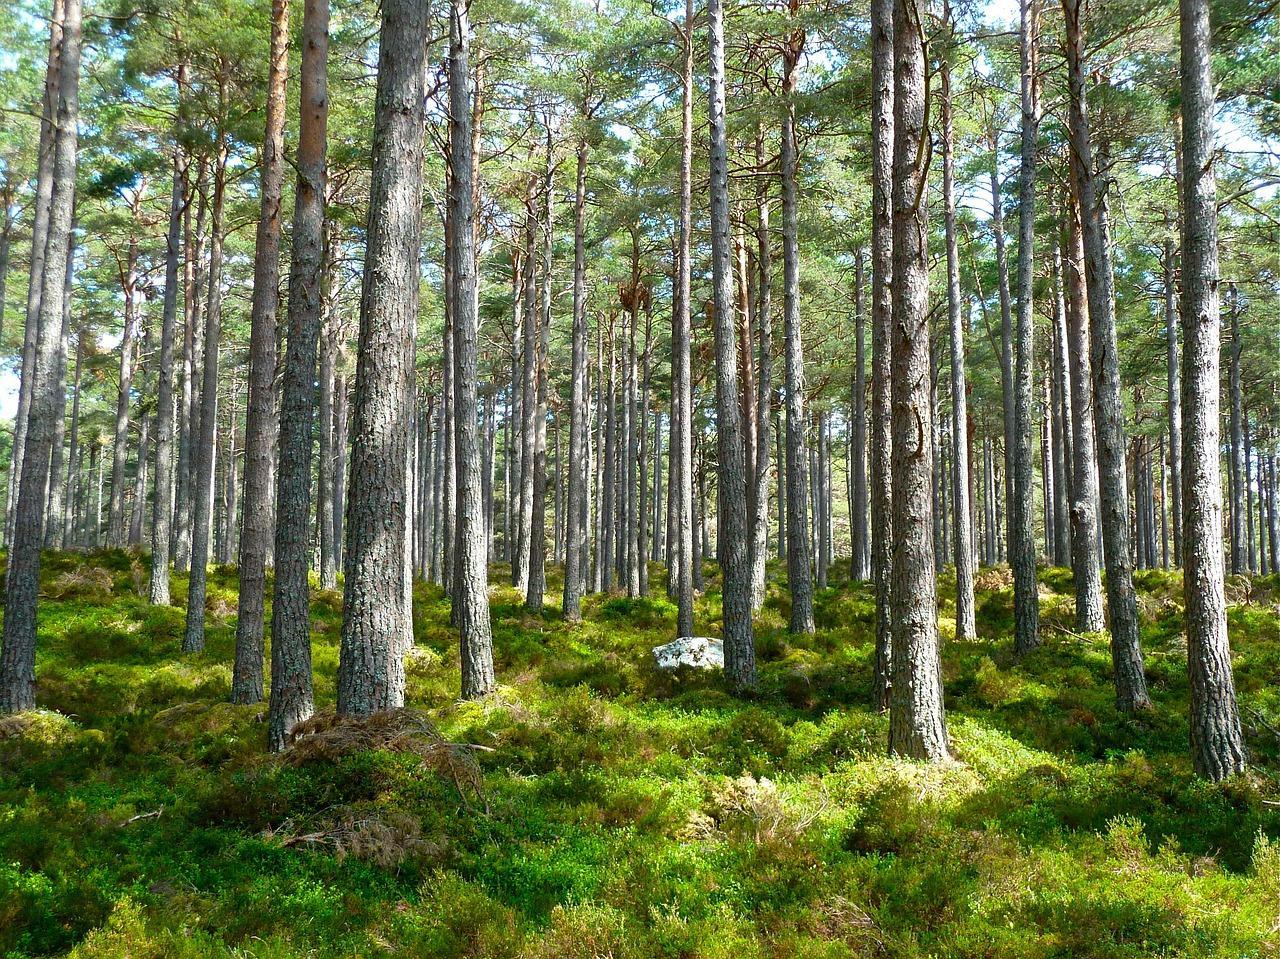 forest-272595_1280-1499296718520.jpg